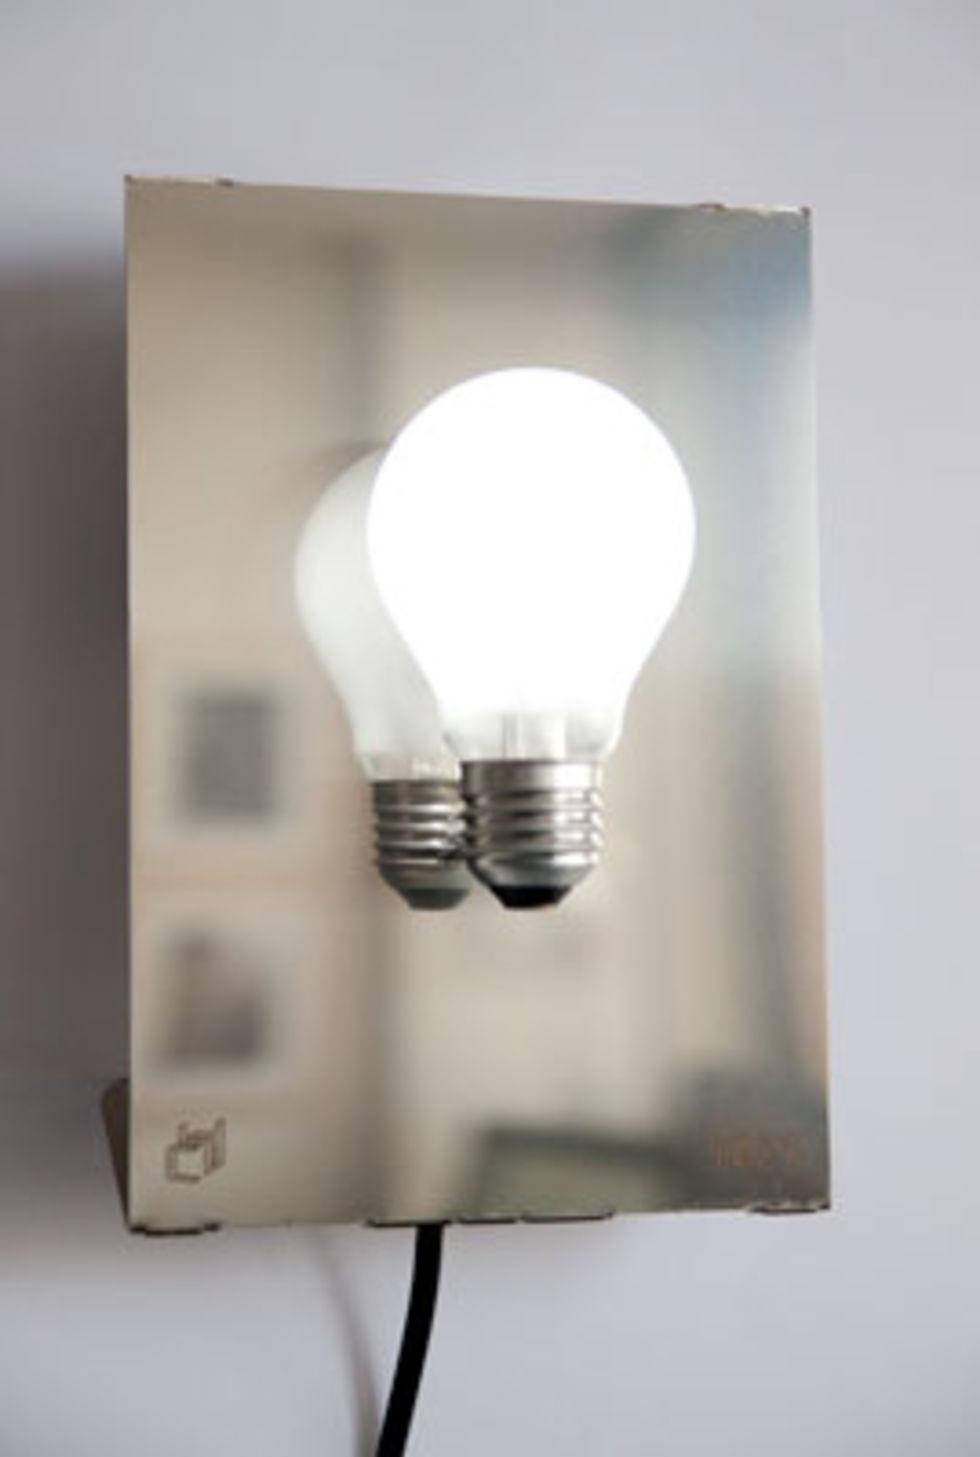 Den sista glödlampan